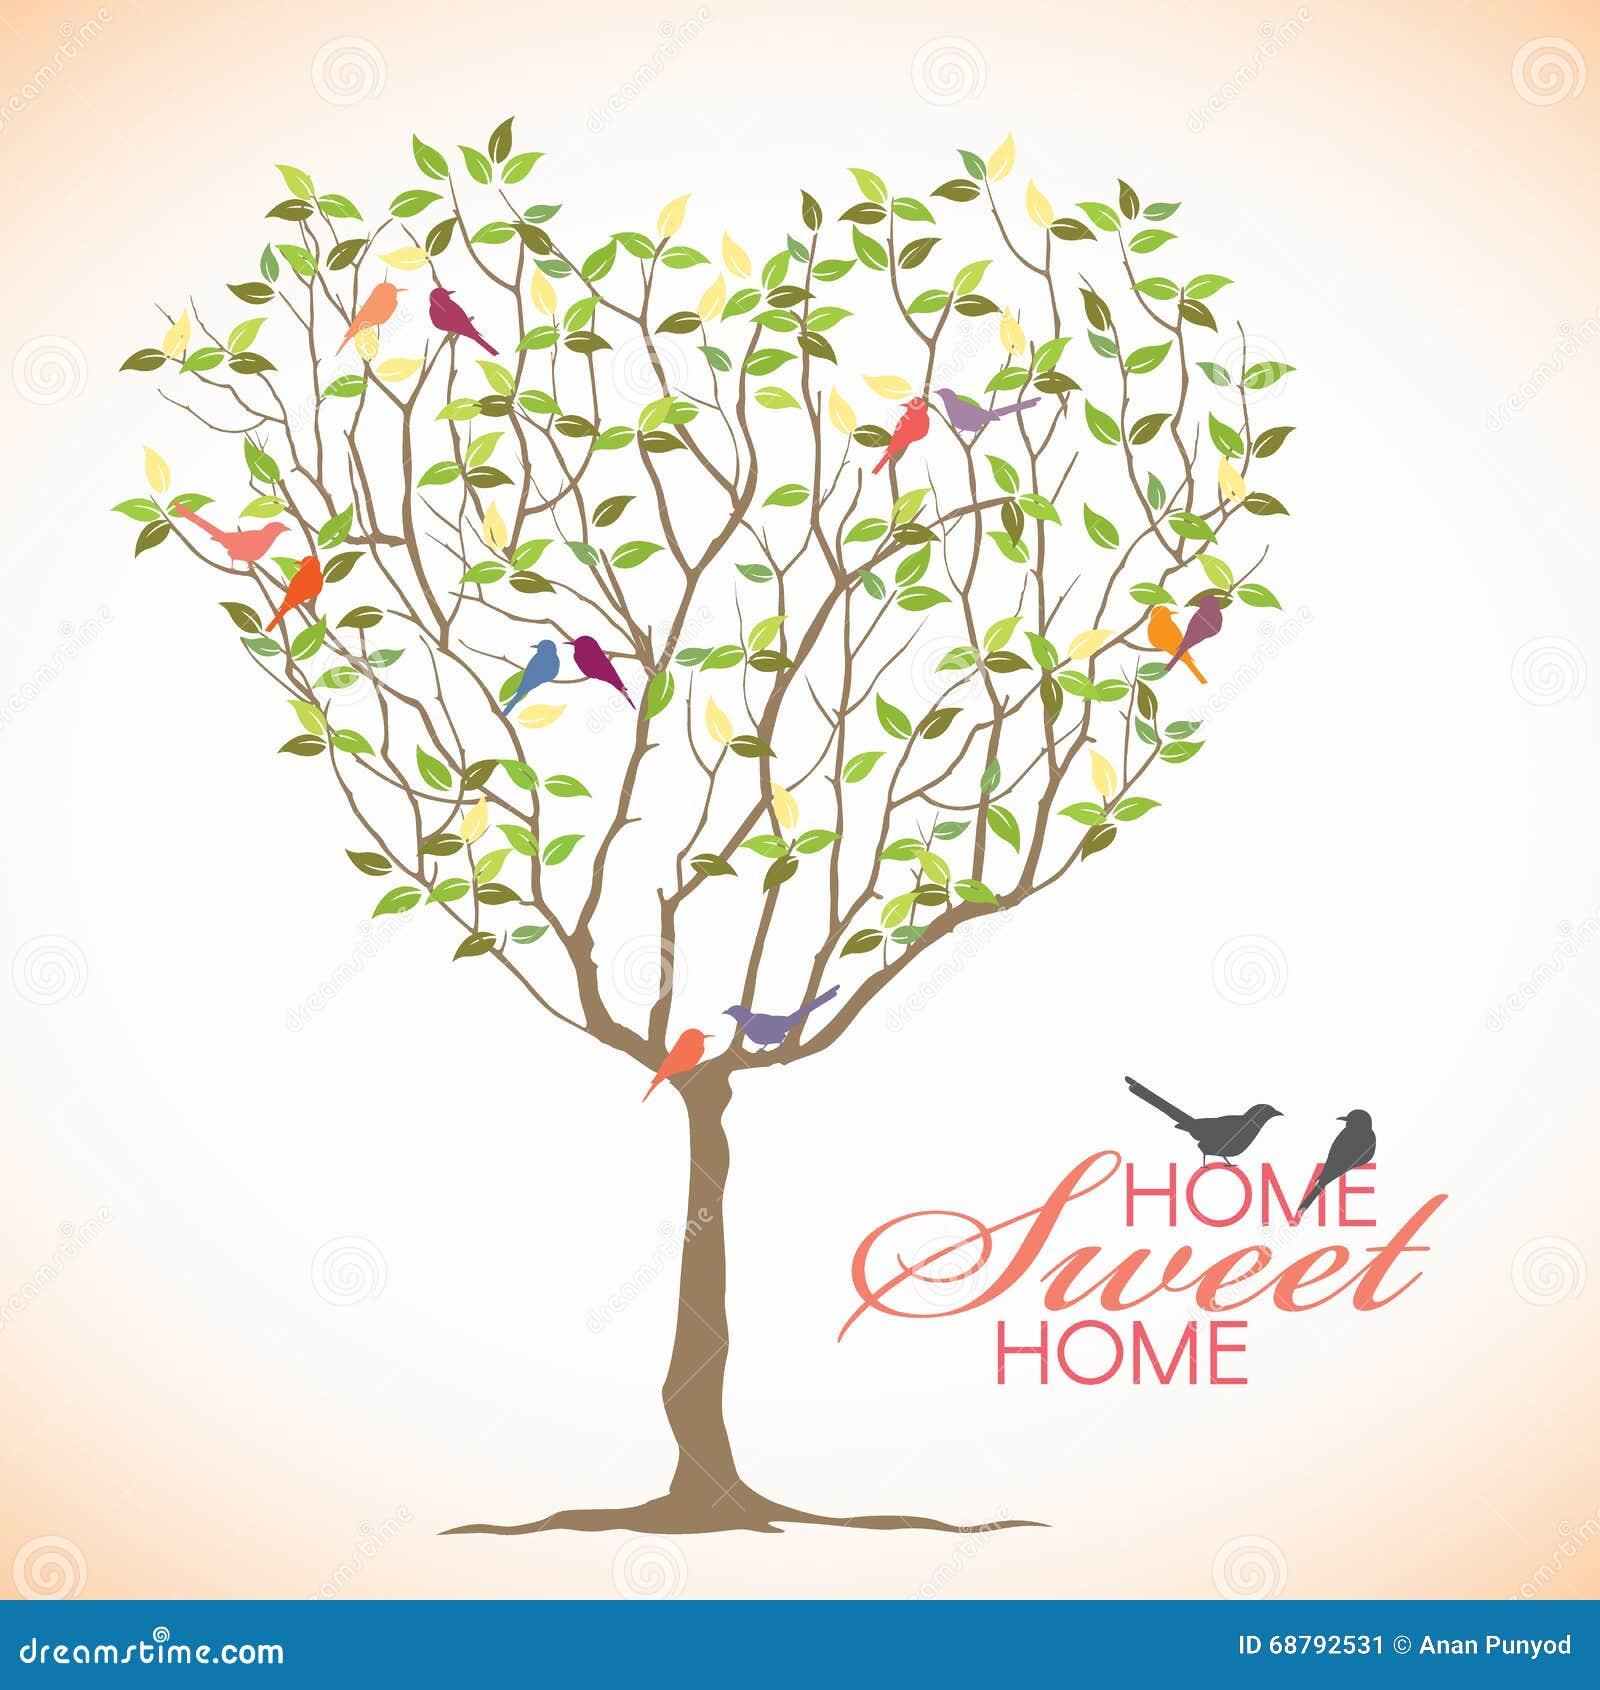 Home Sweet Home - Bird And Heart Tree Vector Design Stock Vector ...